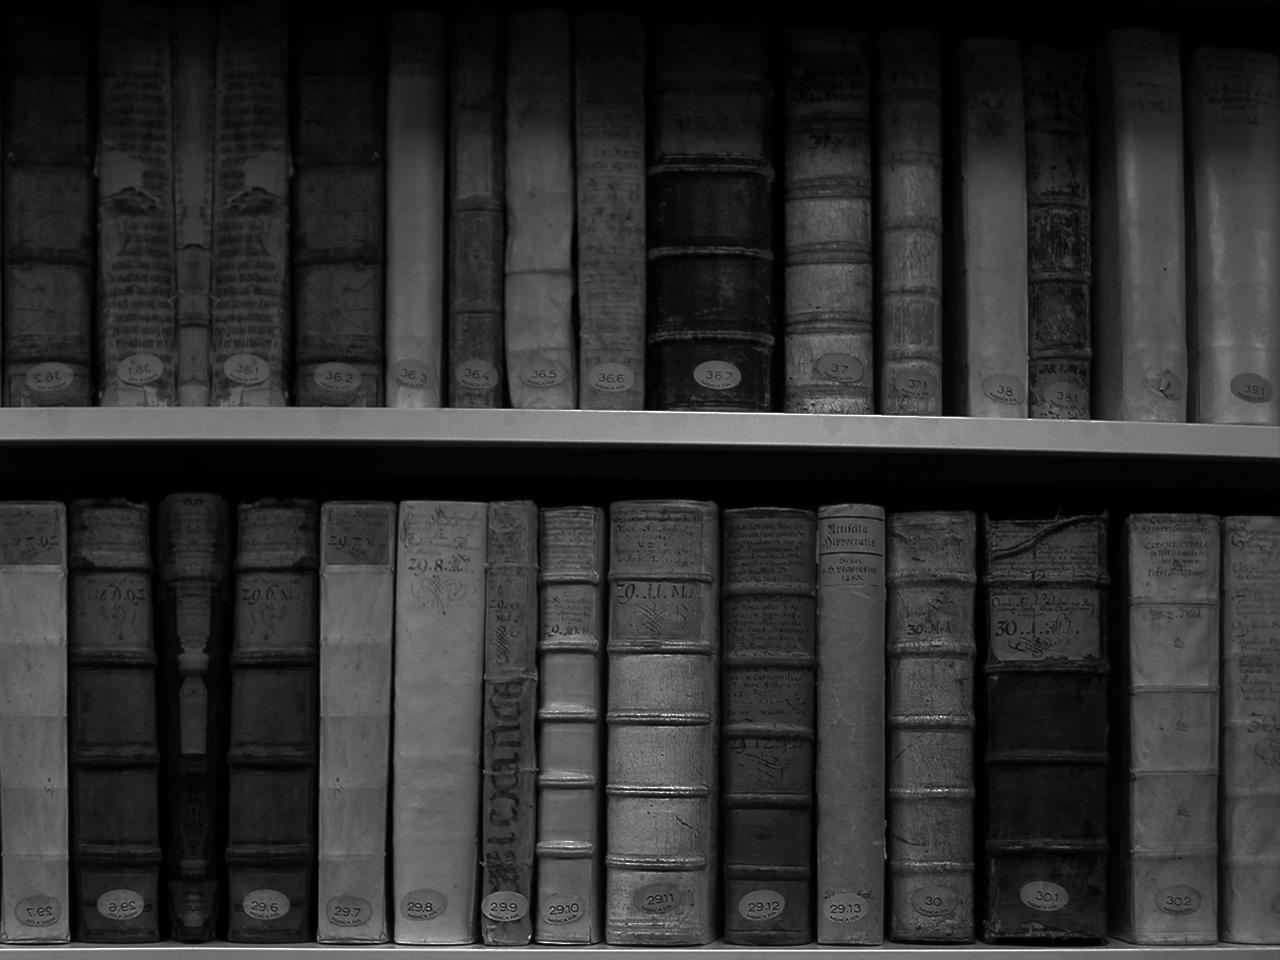 books desktop wallpapers tumblr - photo #8